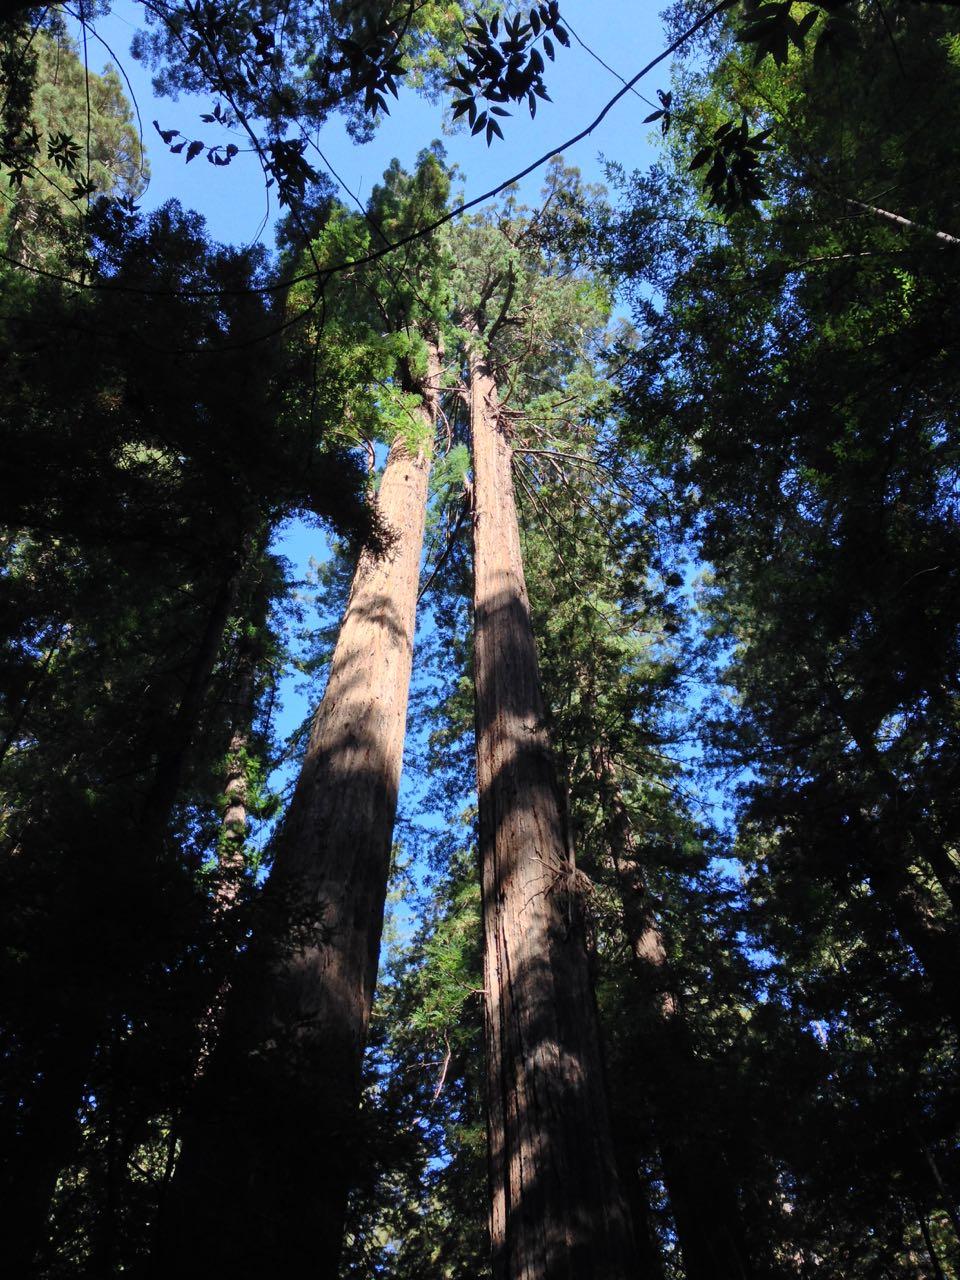 Redwoods 2017 10 01 25 Of 244